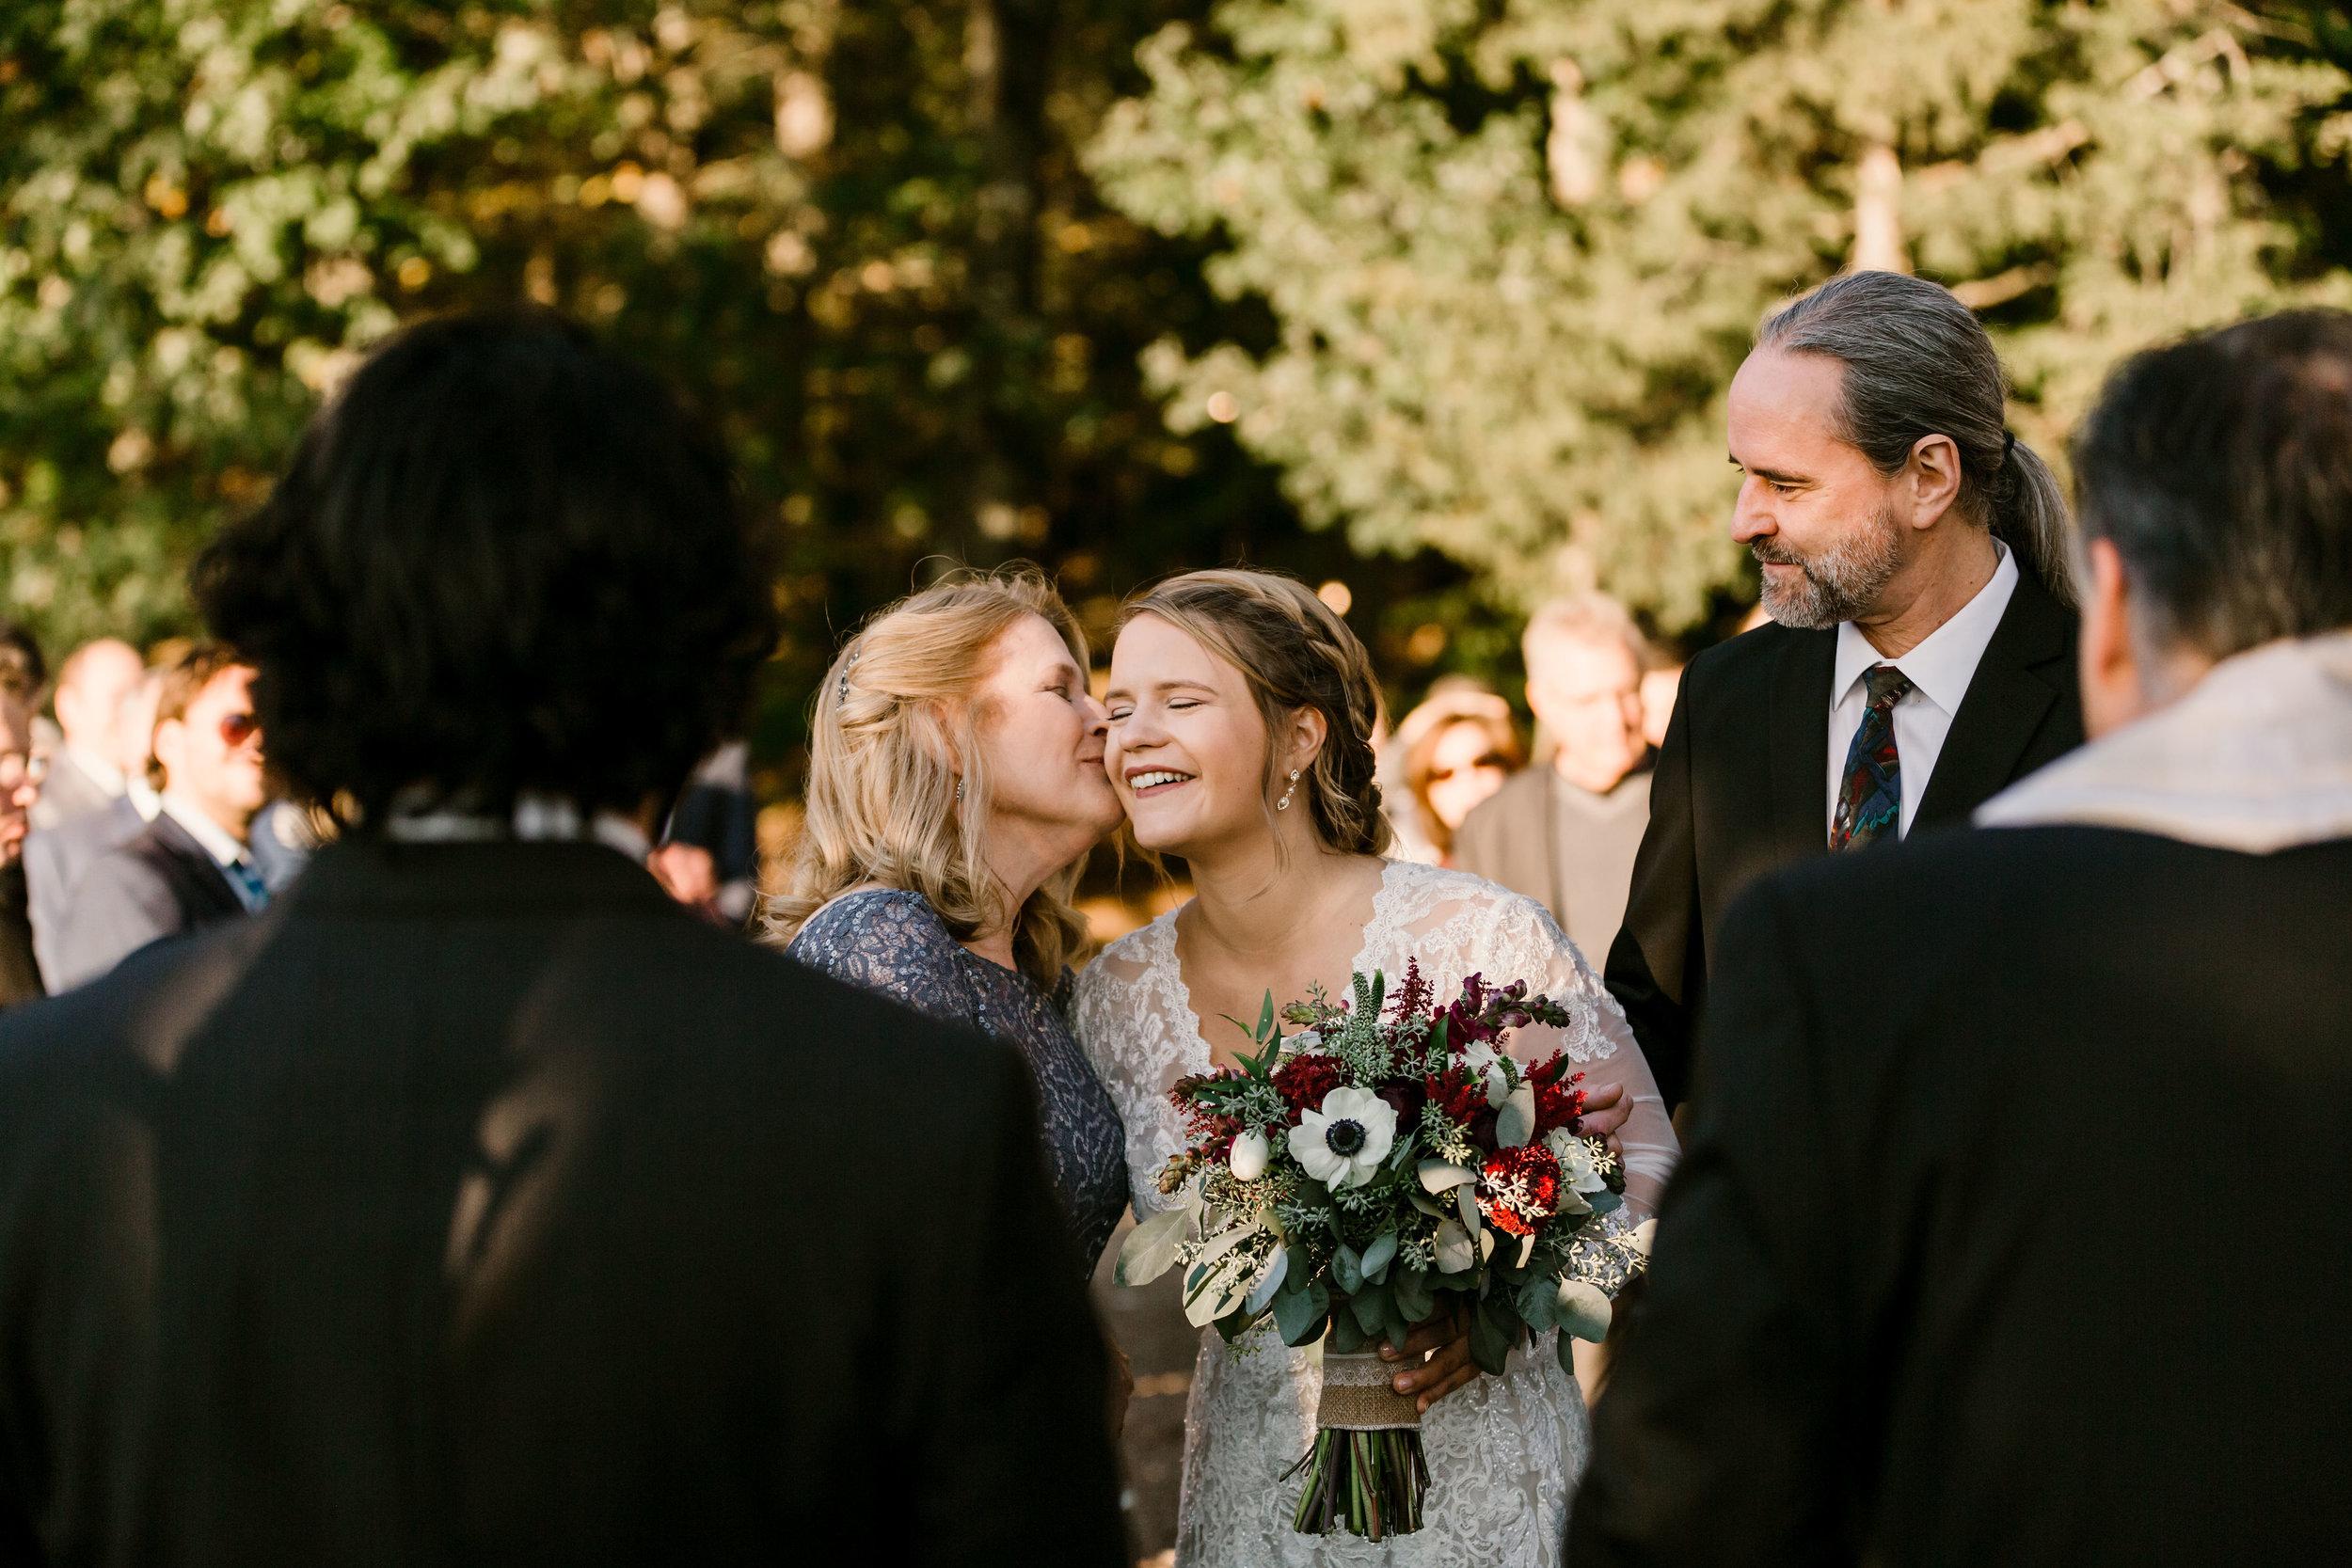 young-love-media-rustic-fall-autumn-wedding-emmerich-tree-farm-hudson-valley-warwick-new-york-ceremony-123.jpg